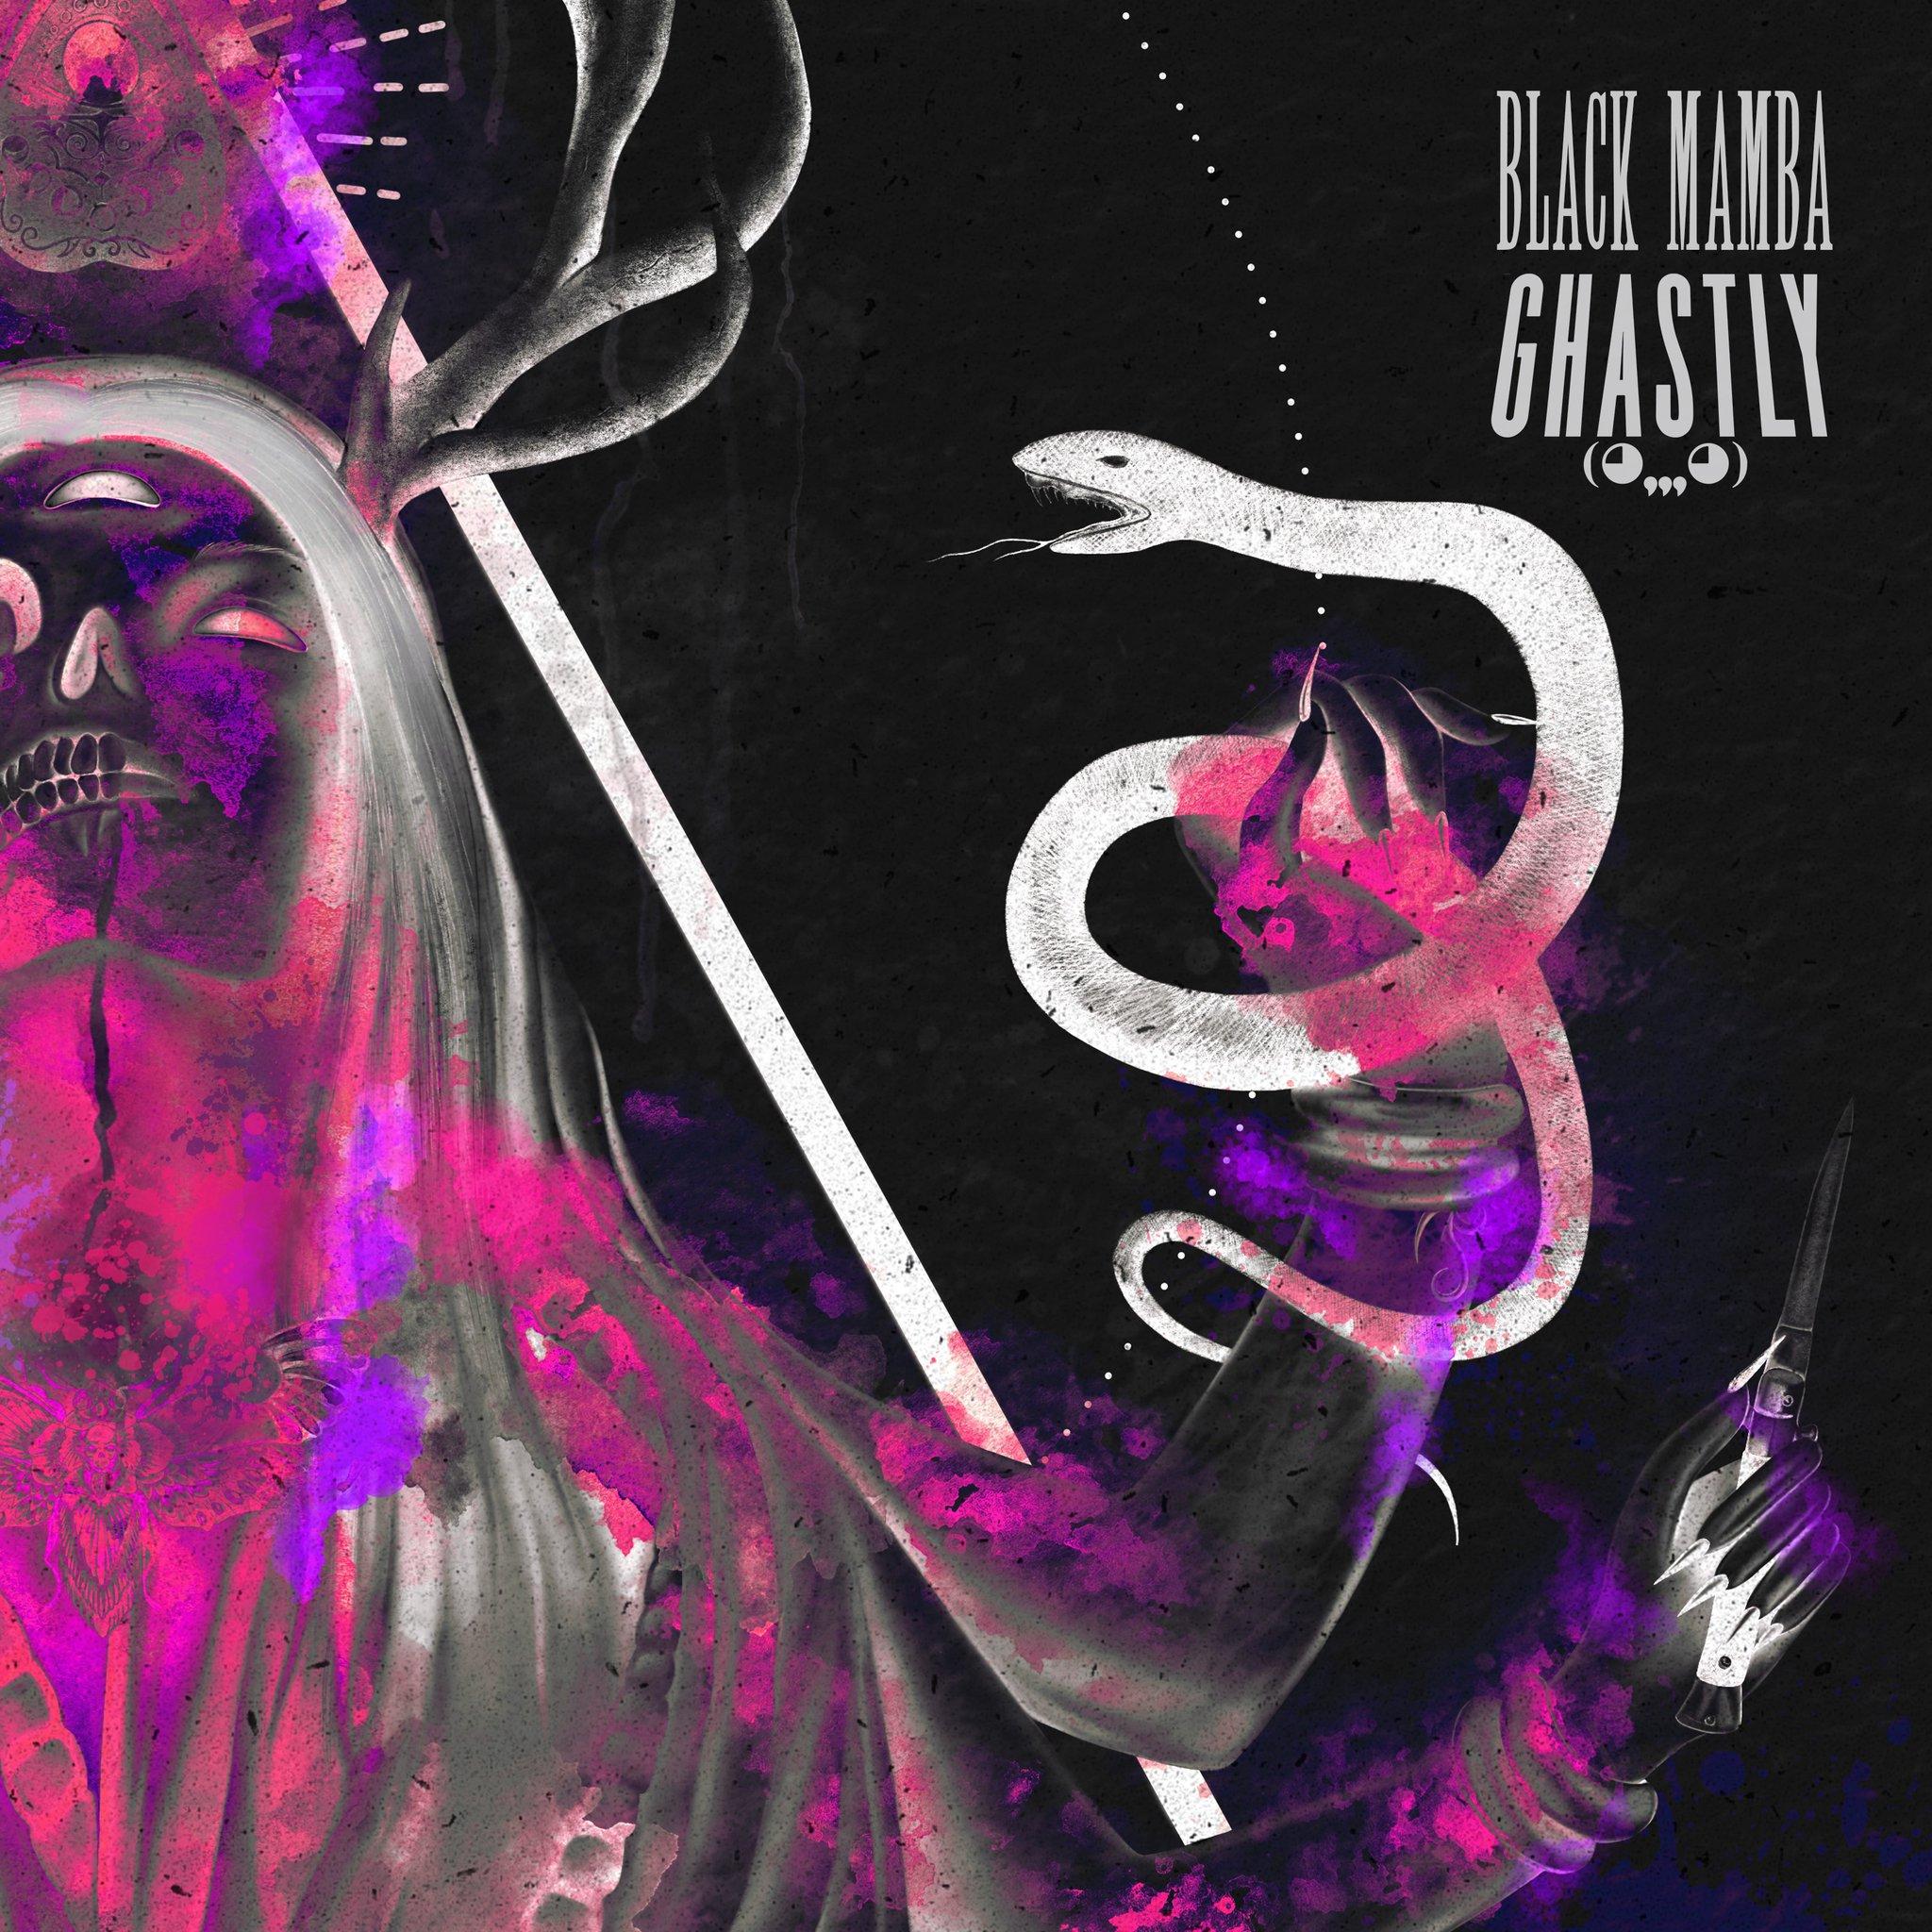 Ghastly - Black Mamba